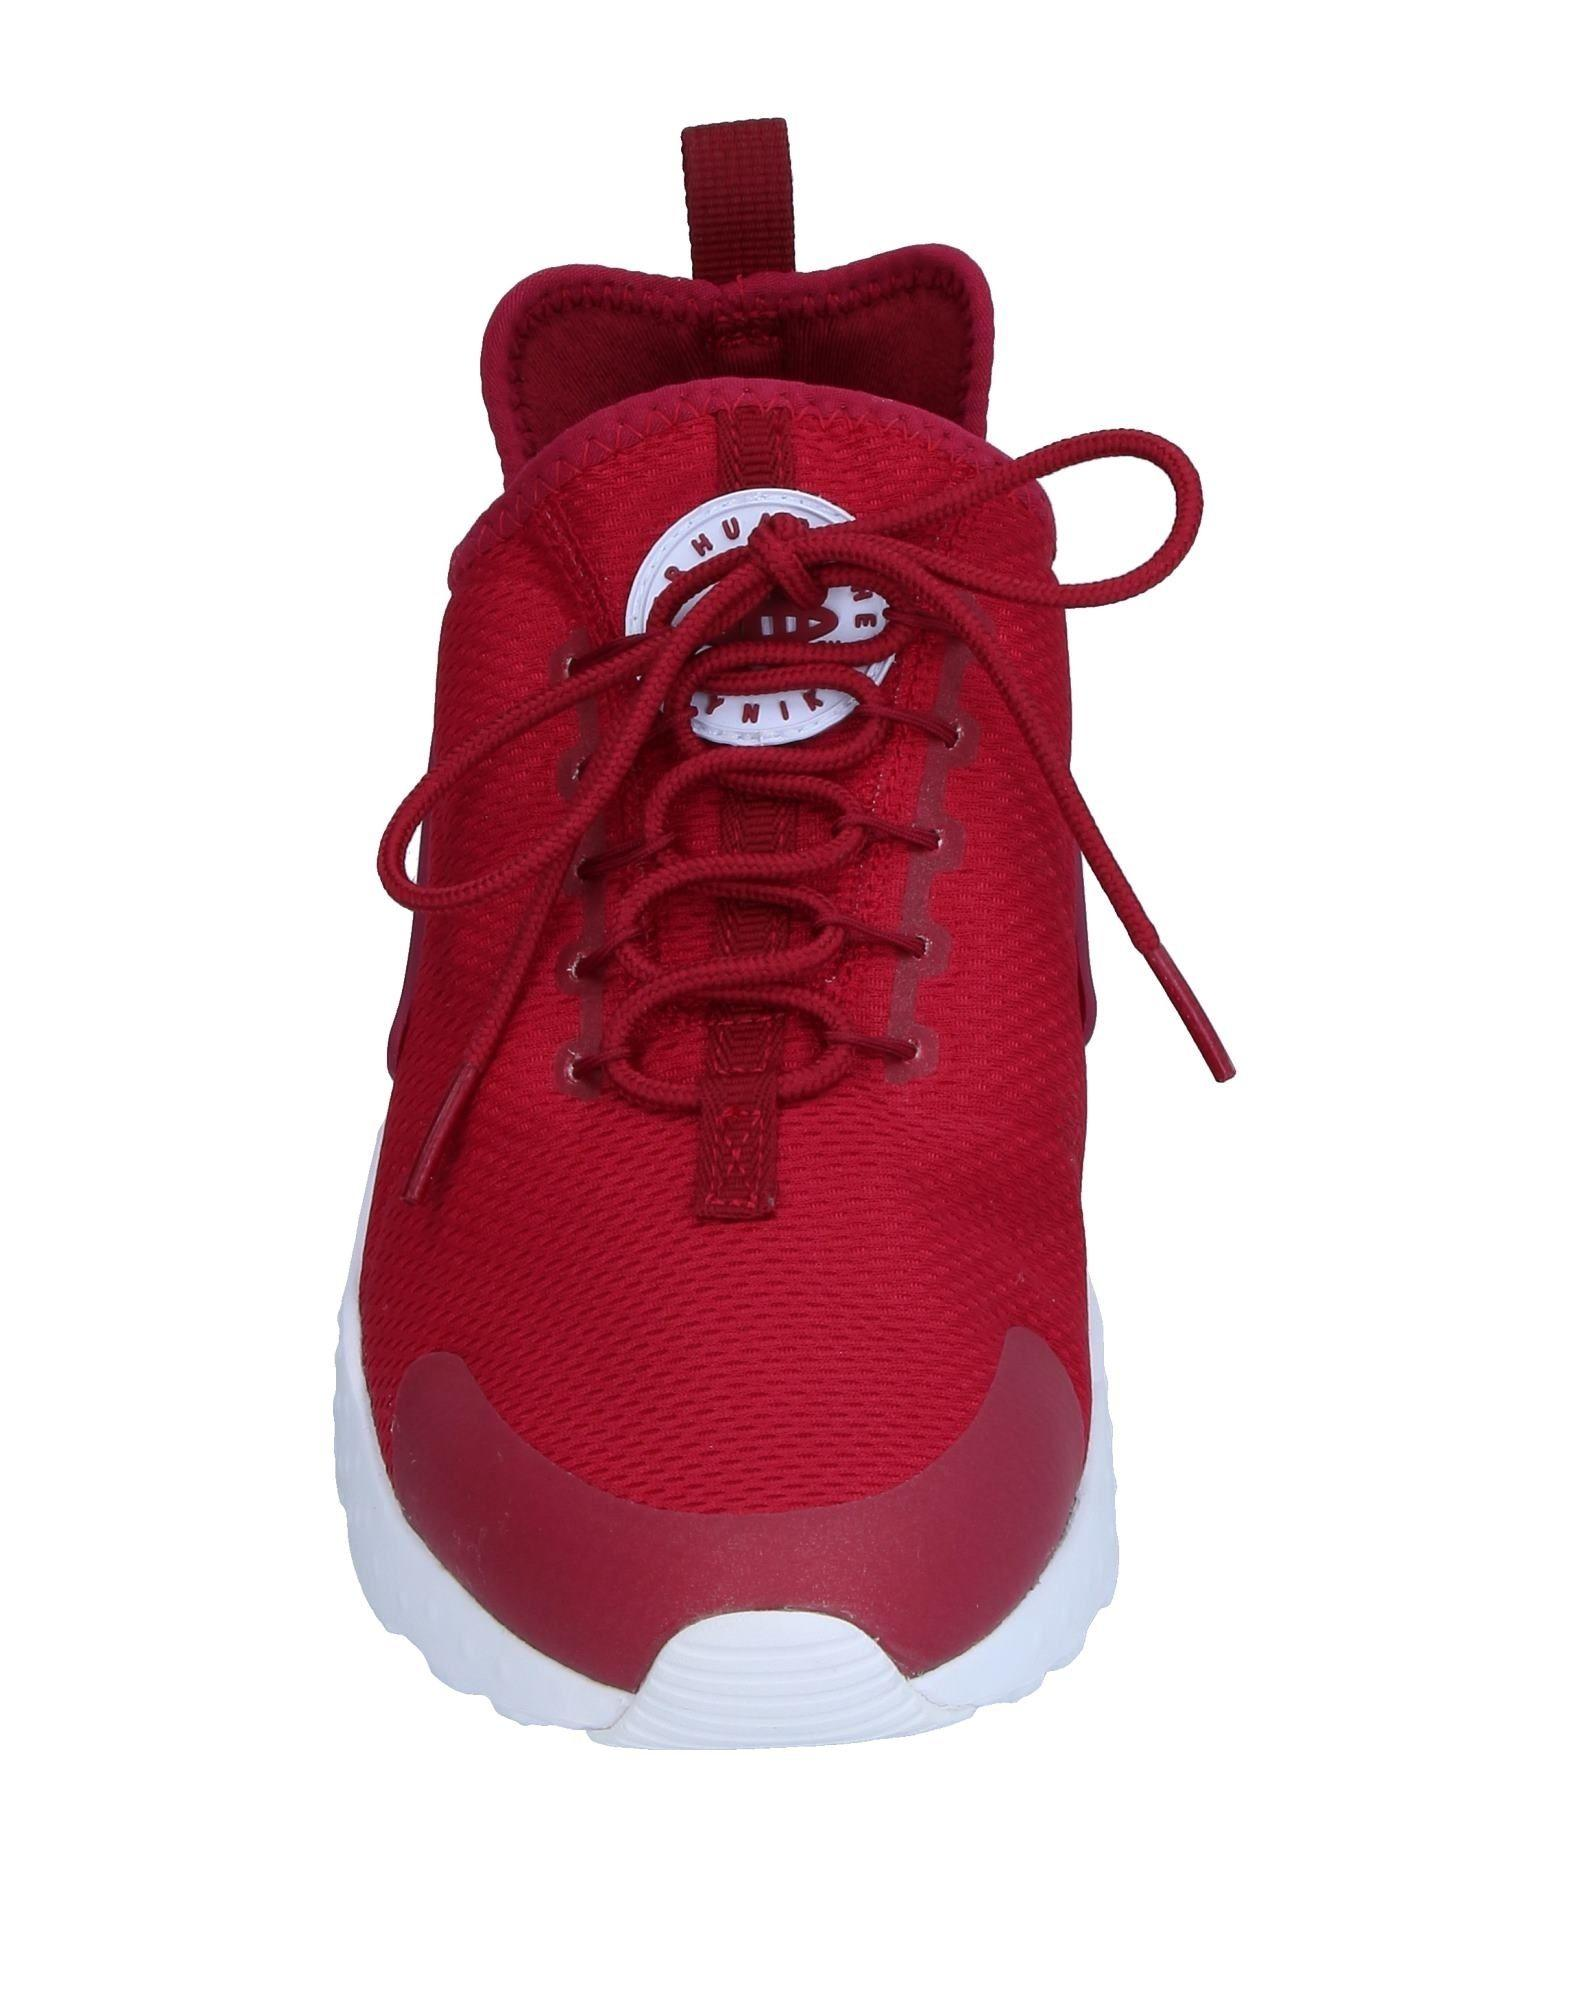 Nike Rubber Low-tops & Sneakers in Garnet (Red)